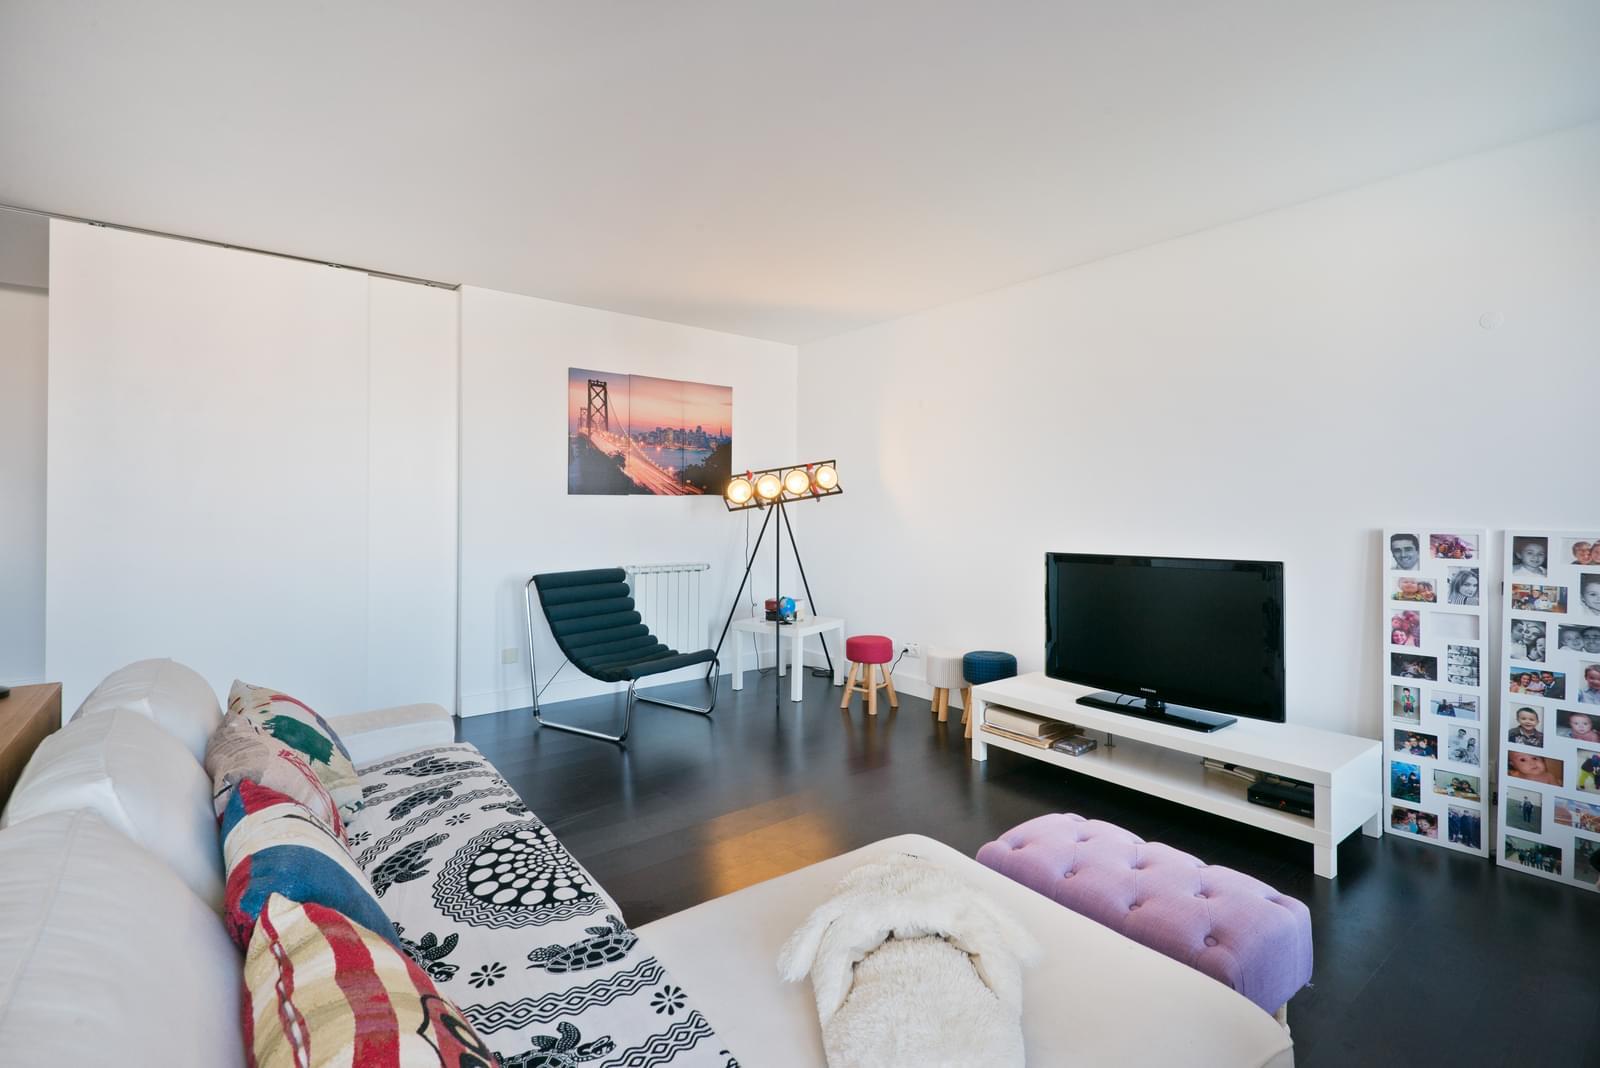 pf17099-apartamento-t3-sintra-4db1e07a-45af-4d06-8b4a-9b6e0035d333